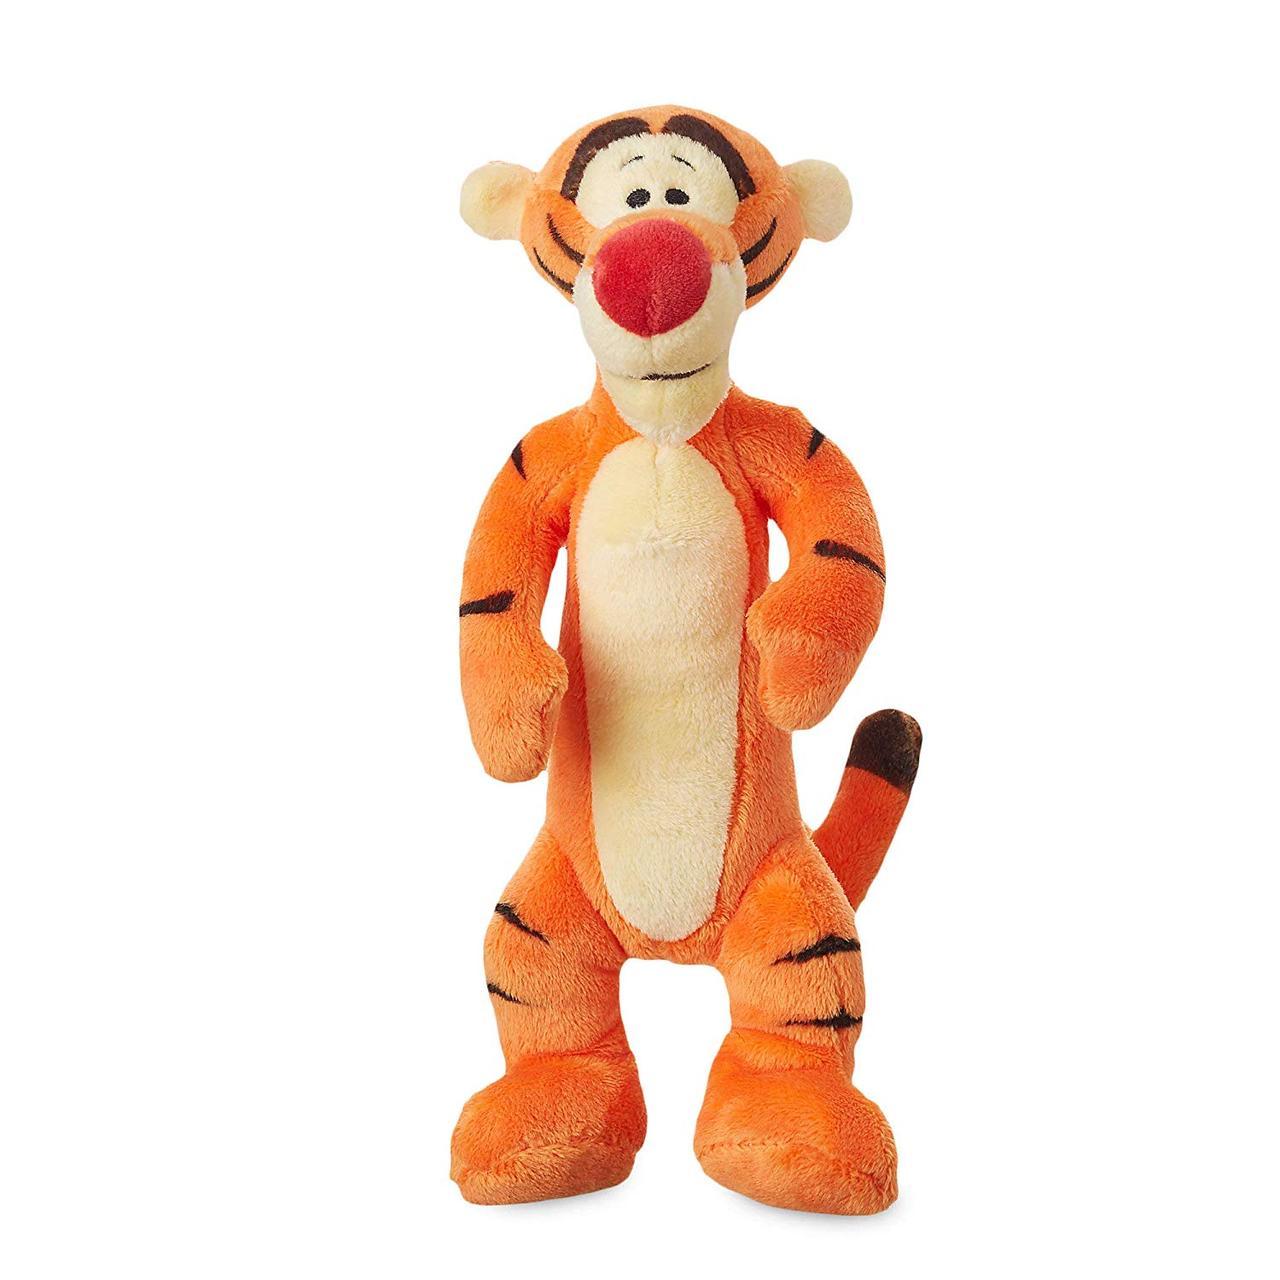 Disney Мягкая игрушка Тигруля 23см - Винни Пух